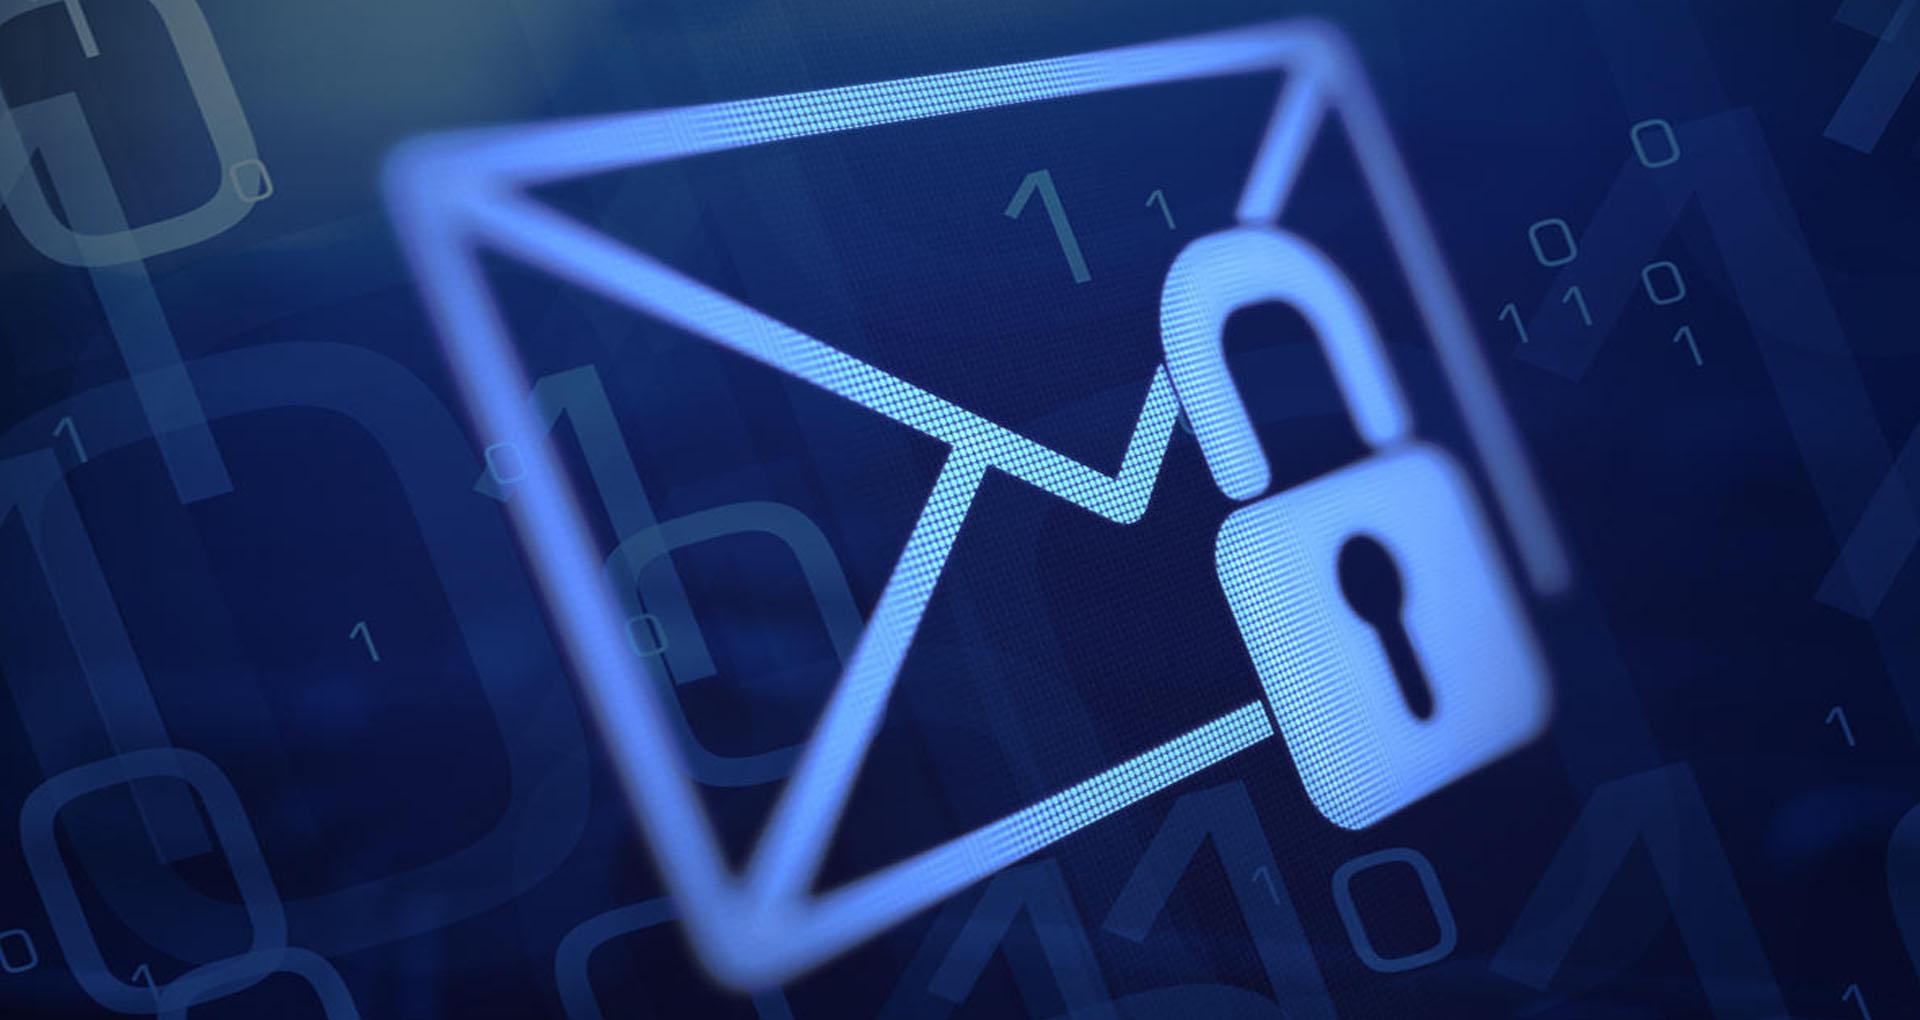 https://dnewpydm90vfx.cloudfront.net/wp-content/uploads/2021/05/Email-security-2020.jpg